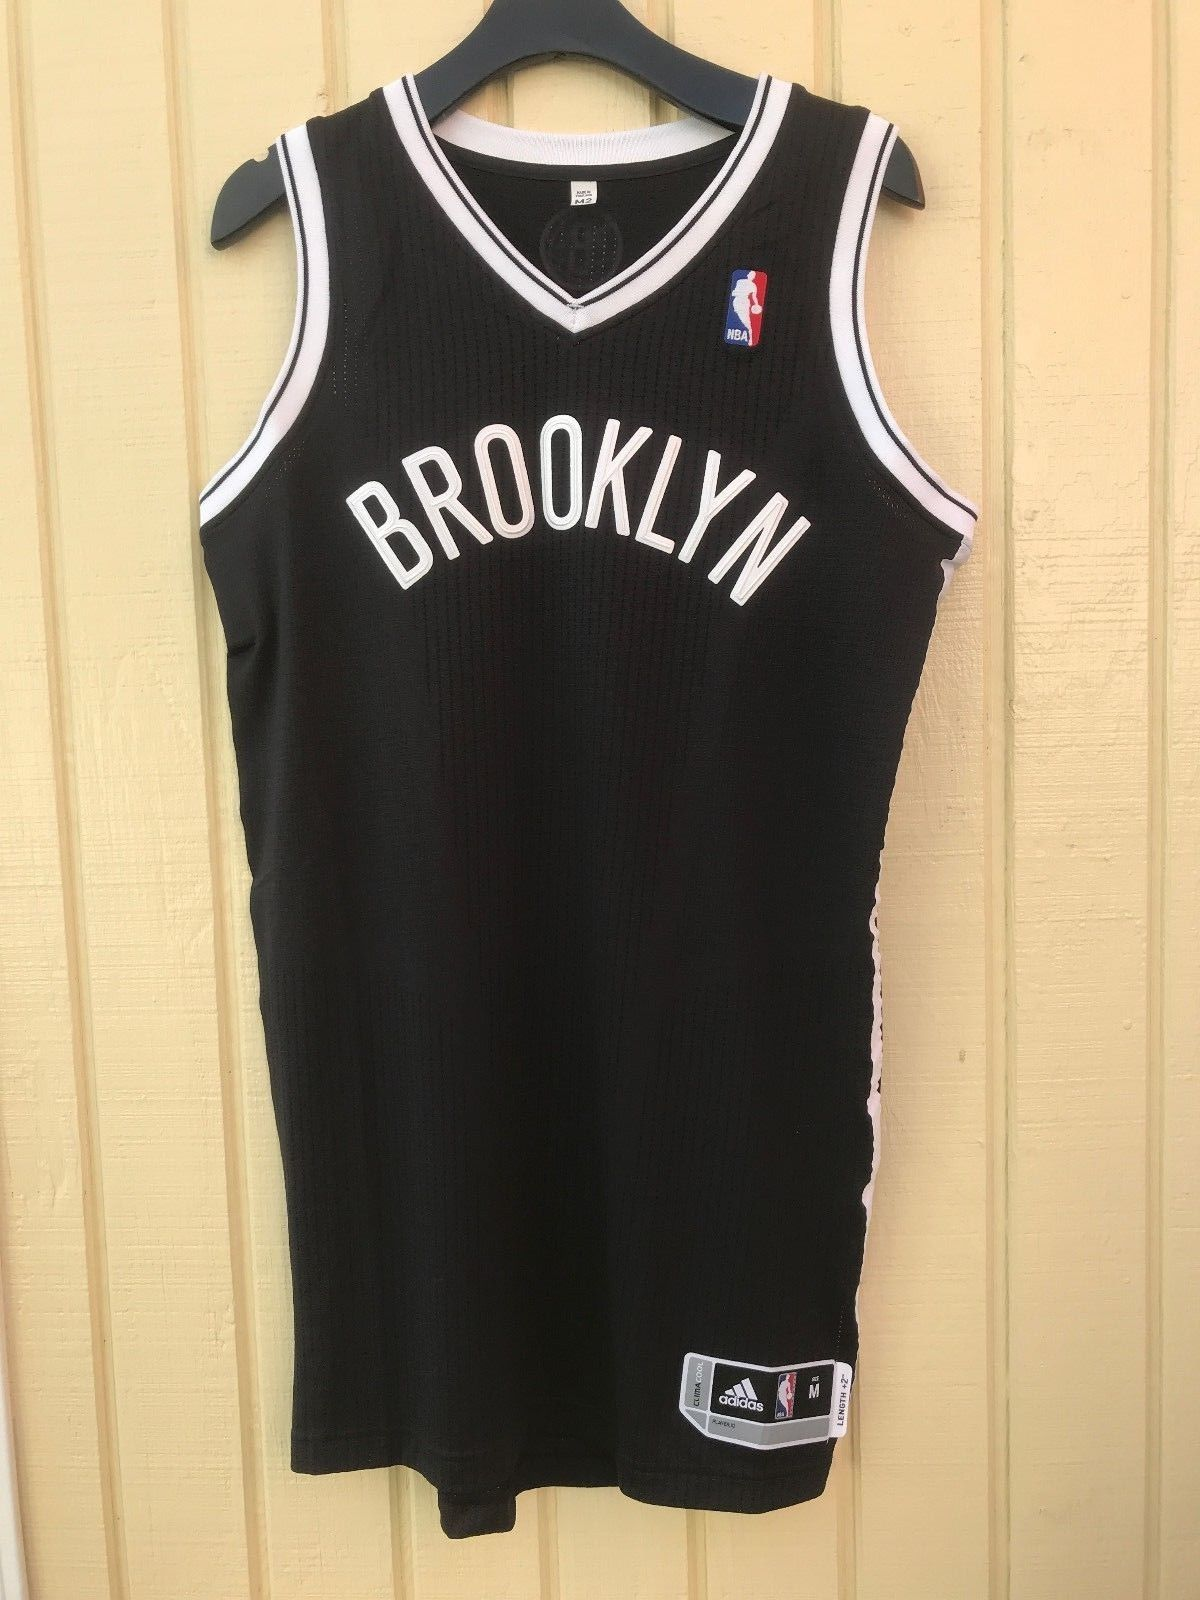 990131b3d86 Brooklyn Nets adidas Rev30 Blank Road Black NBA Basketball Jersey ...